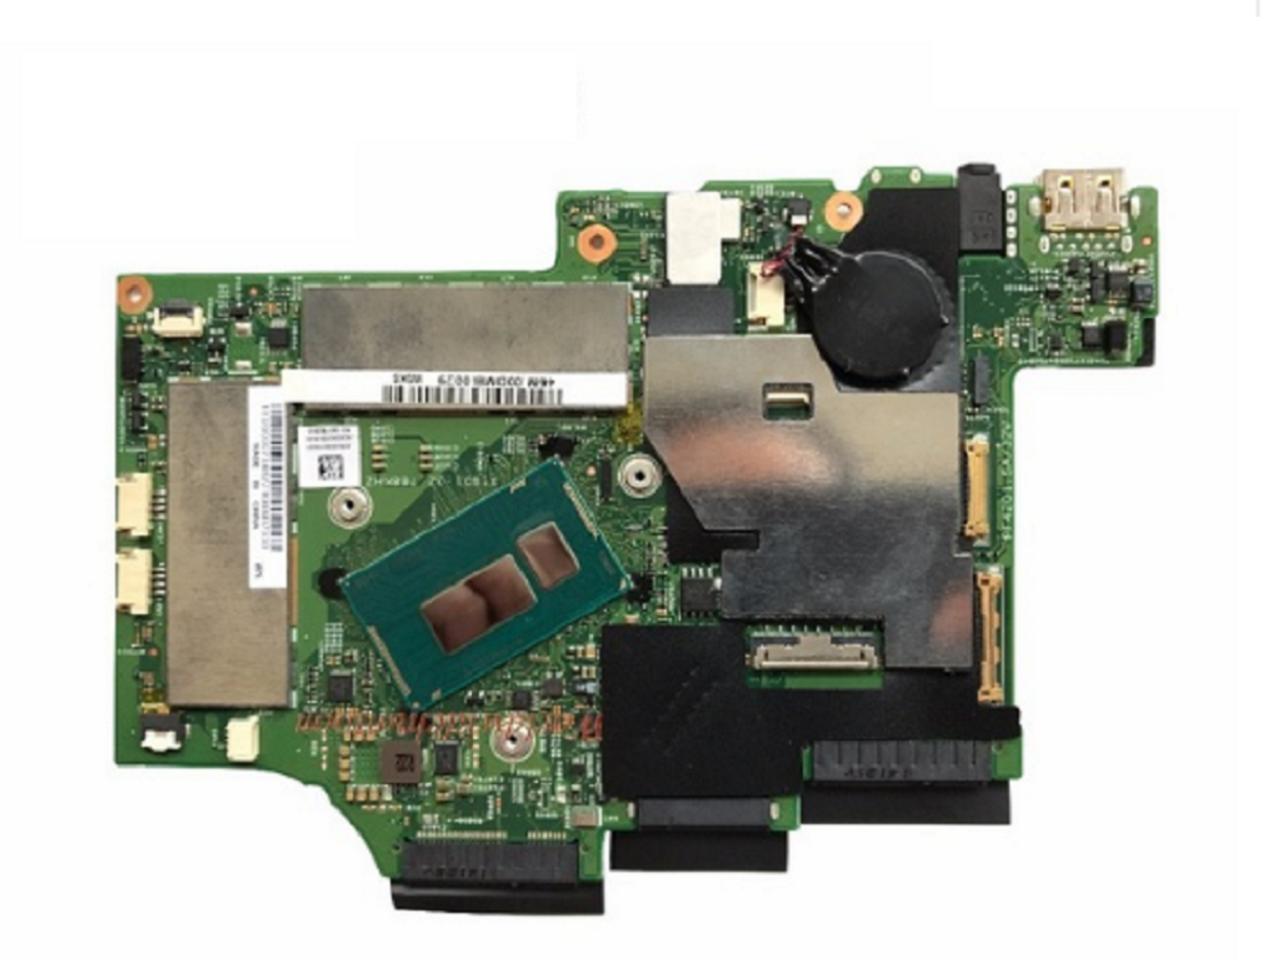 Tablet Motherboard for Lenovo IdeaPad Miix 2 11 LTM11 MB W8.1P UMA I5-4202Y 8G for 90006932 46m.00dmb.0014 New